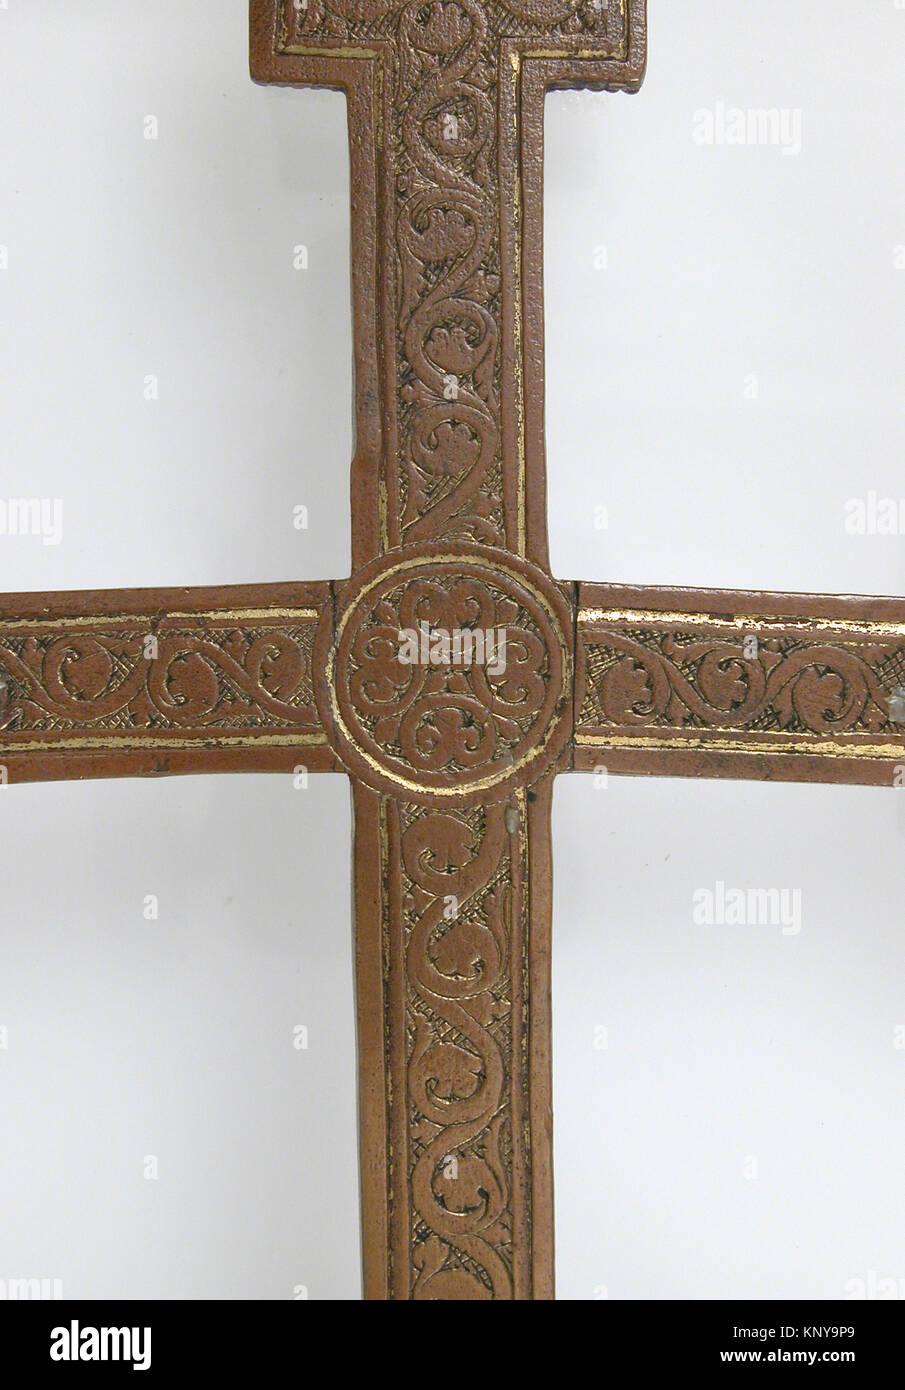 Cross met sf17 190 341cd5 464321 mosan cross 12th century copper cross met sf17 190 341cd5 464321 mosan cross 12th century copper overall 11 14 x 6 x 1 34 in 285 x 152 x 45 cm the metropolitan museum of art buycottarizona Image collections